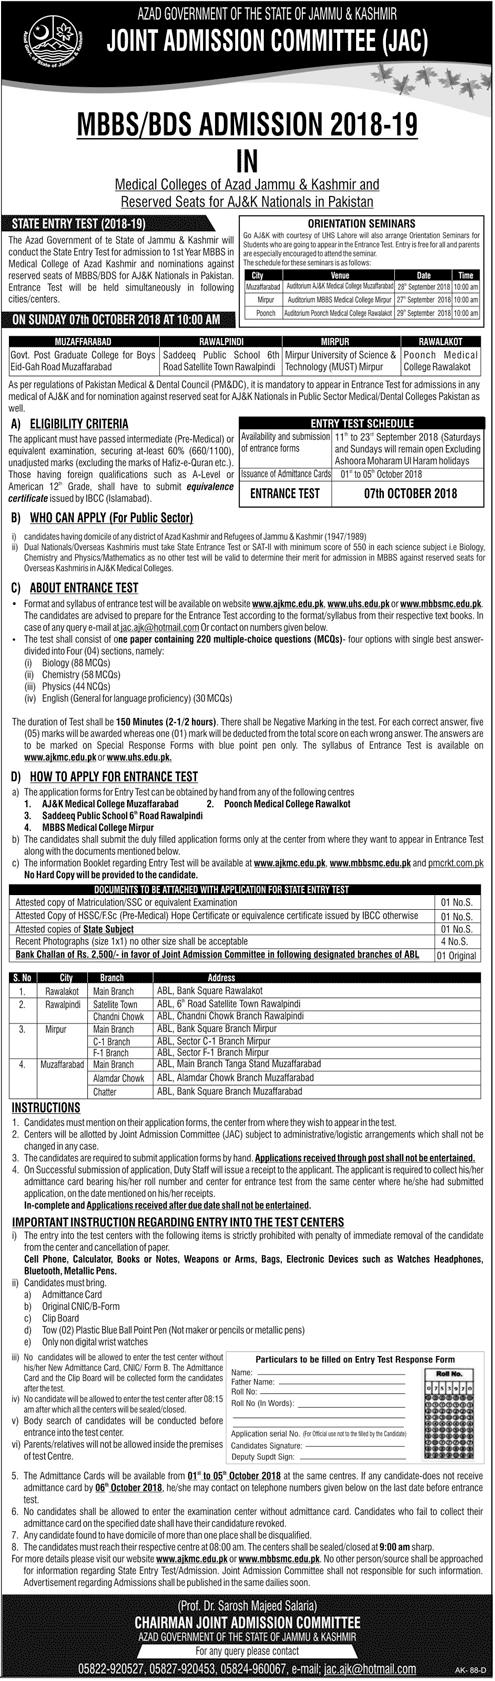 AJK Medical Colleges State Entry Test Application Form 2018